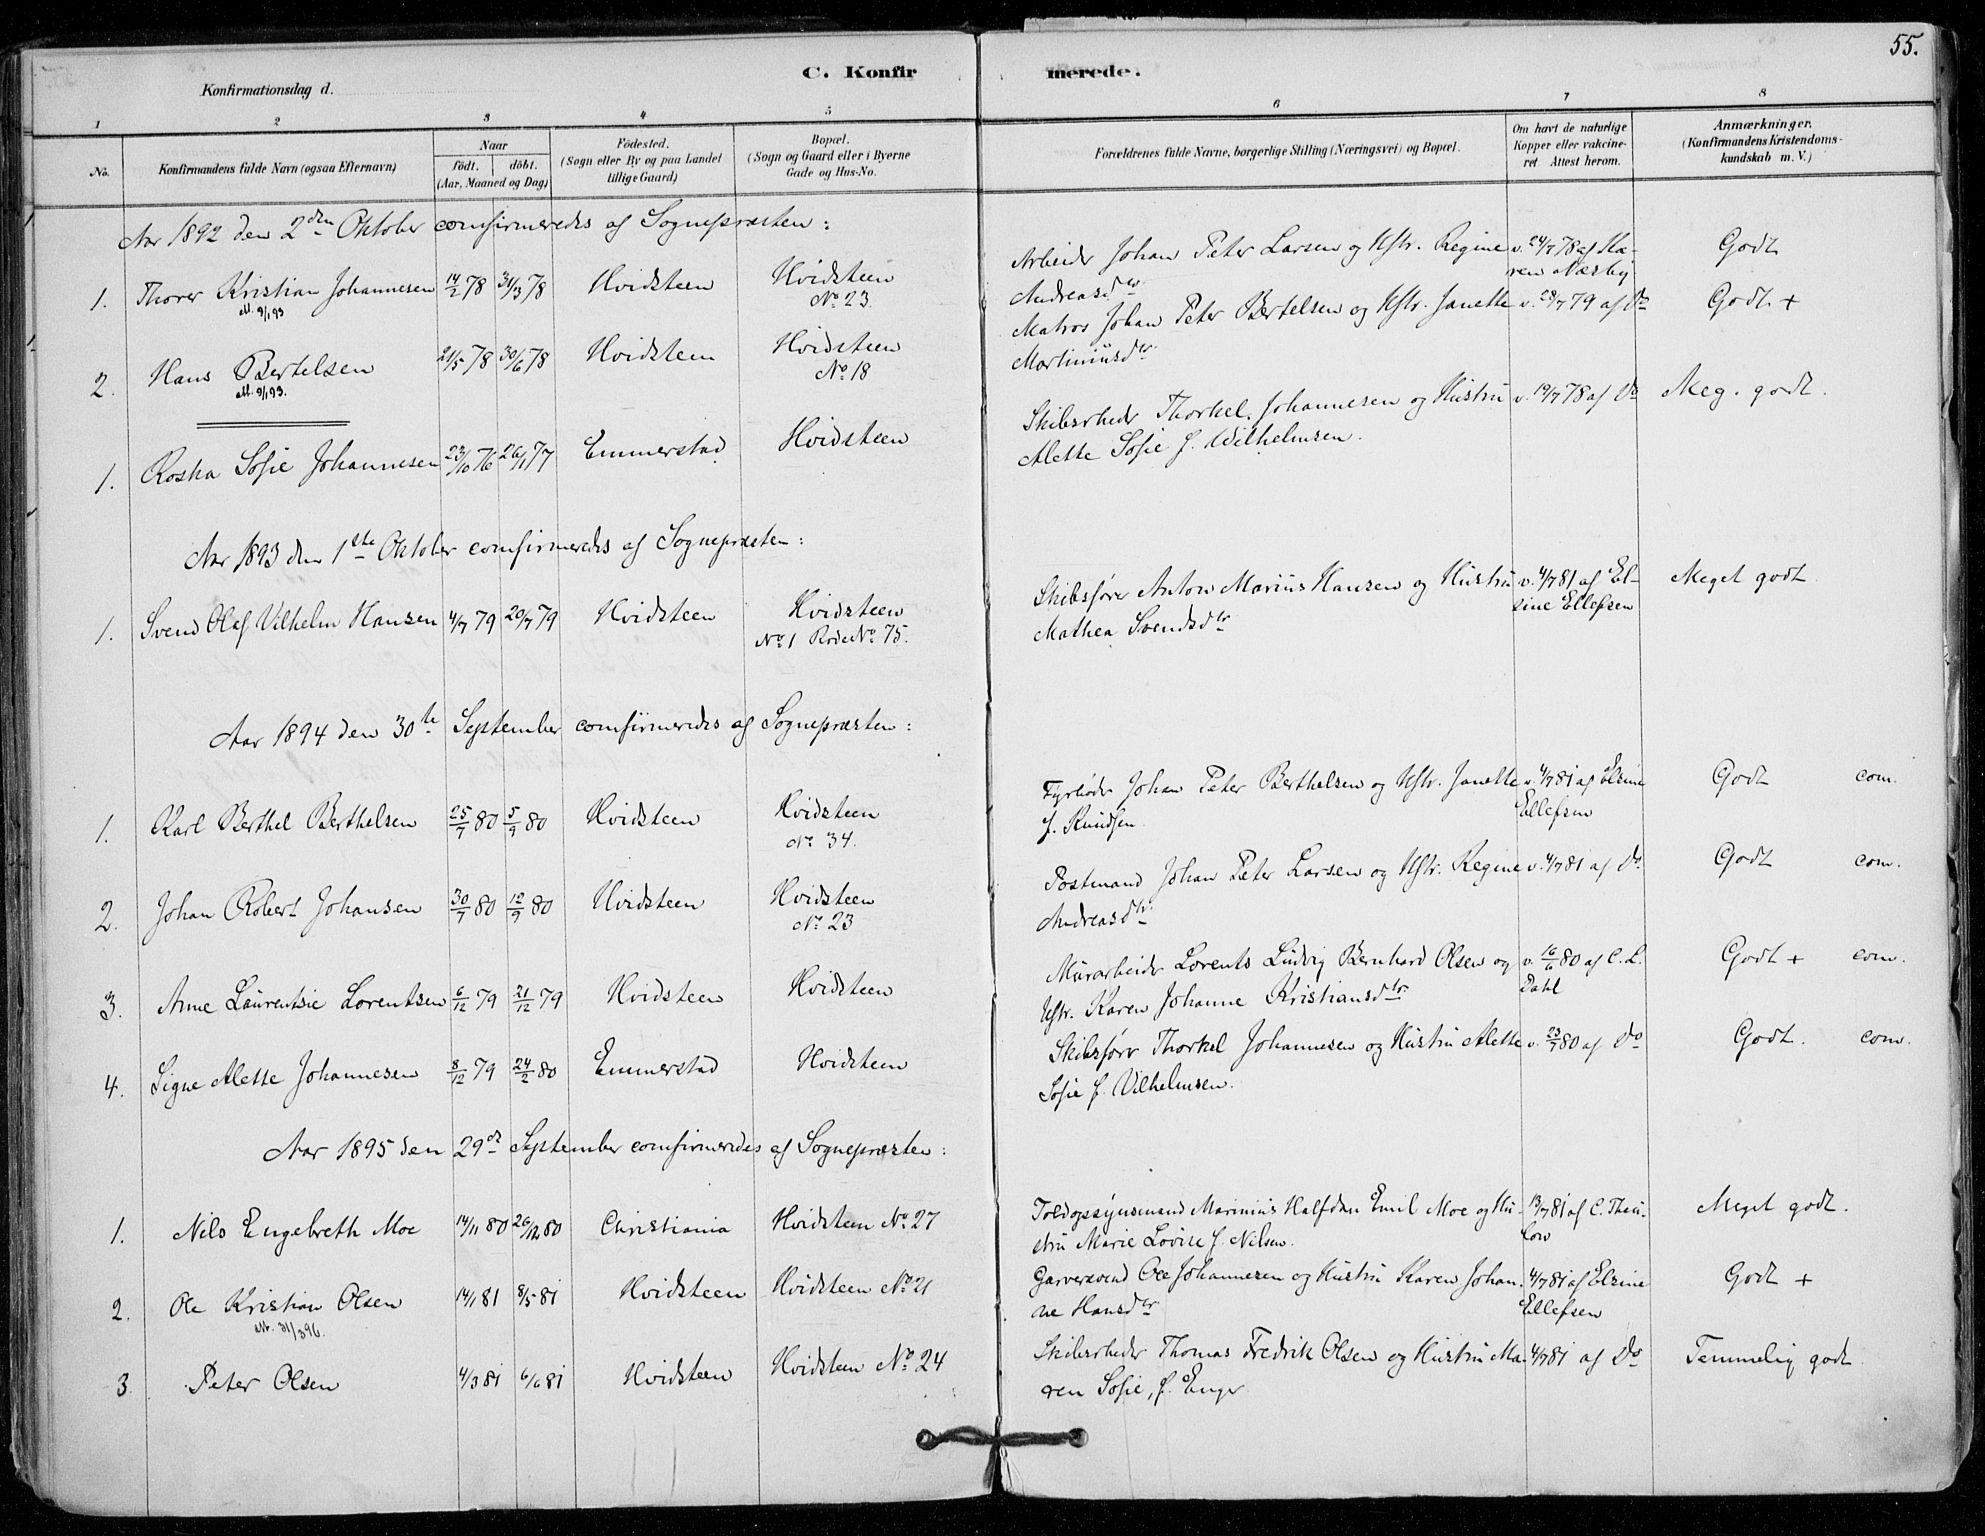 SAO, Vestby prestekontor Kirkebøker, F/Fd/L0001: Ministerialbok nr. IV 1, 1878-1945, s. 55